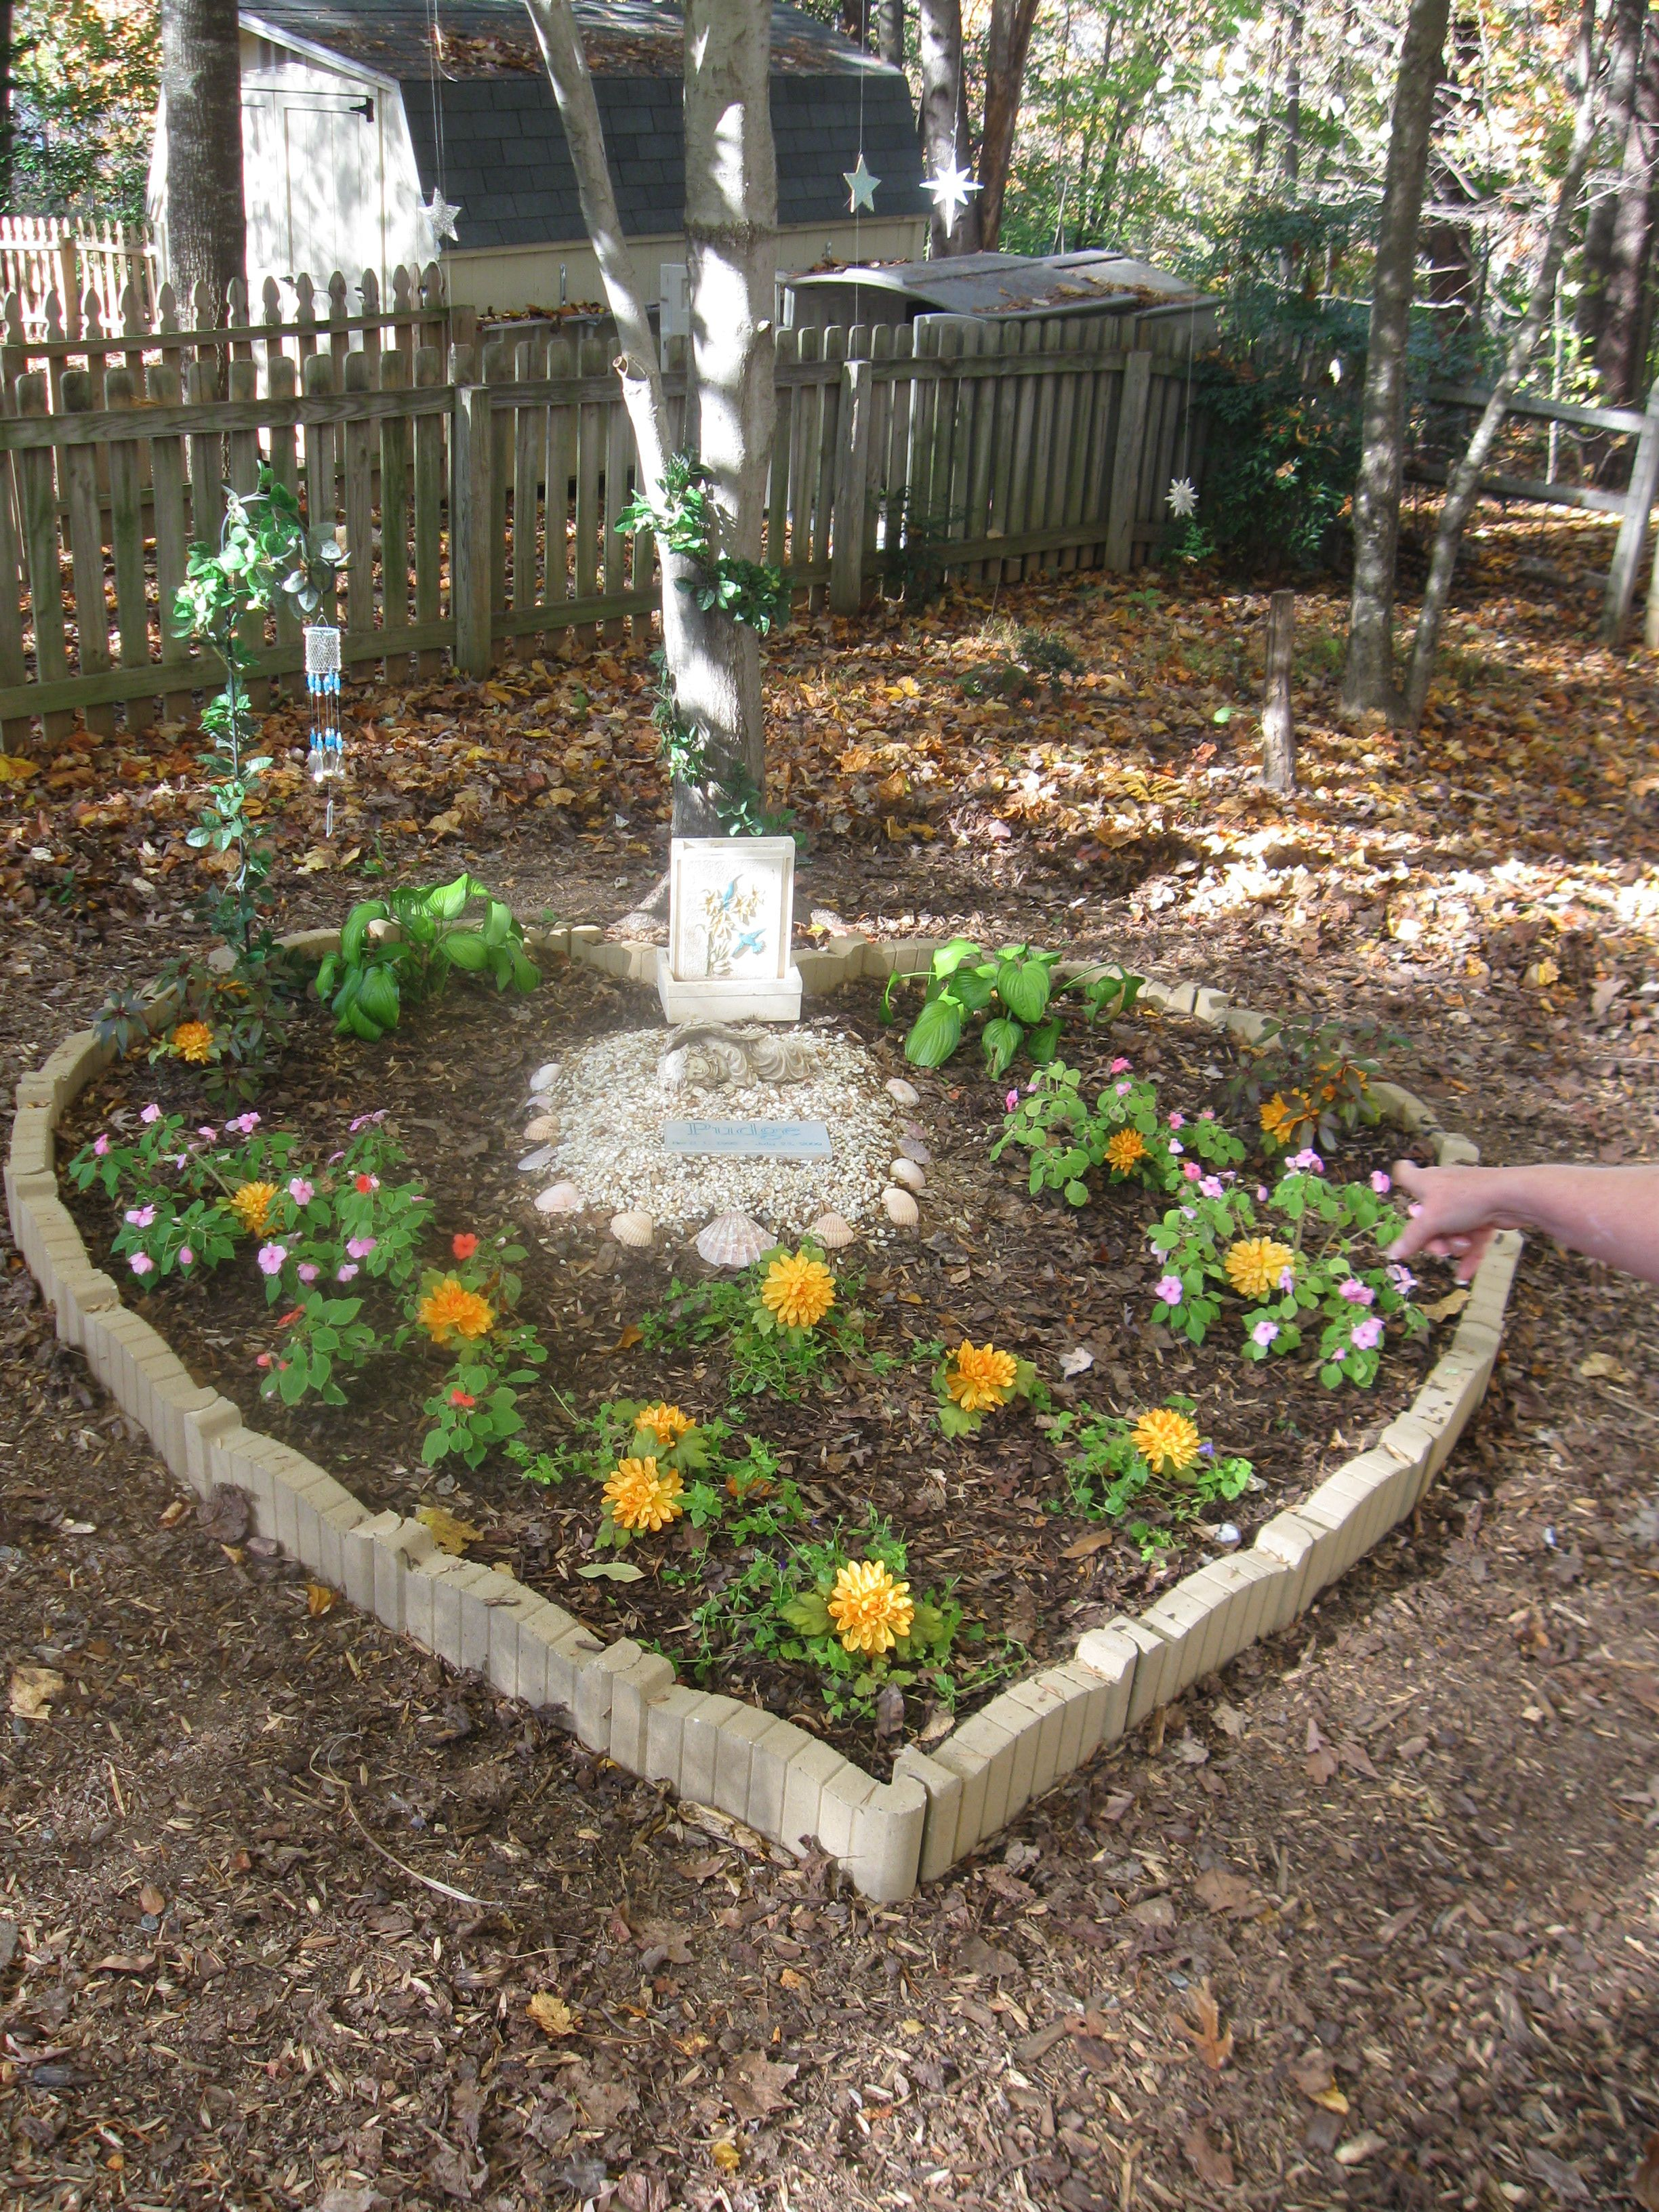 memory gardens - Google Search | Dog | Pinterest | Gardens, Google ...